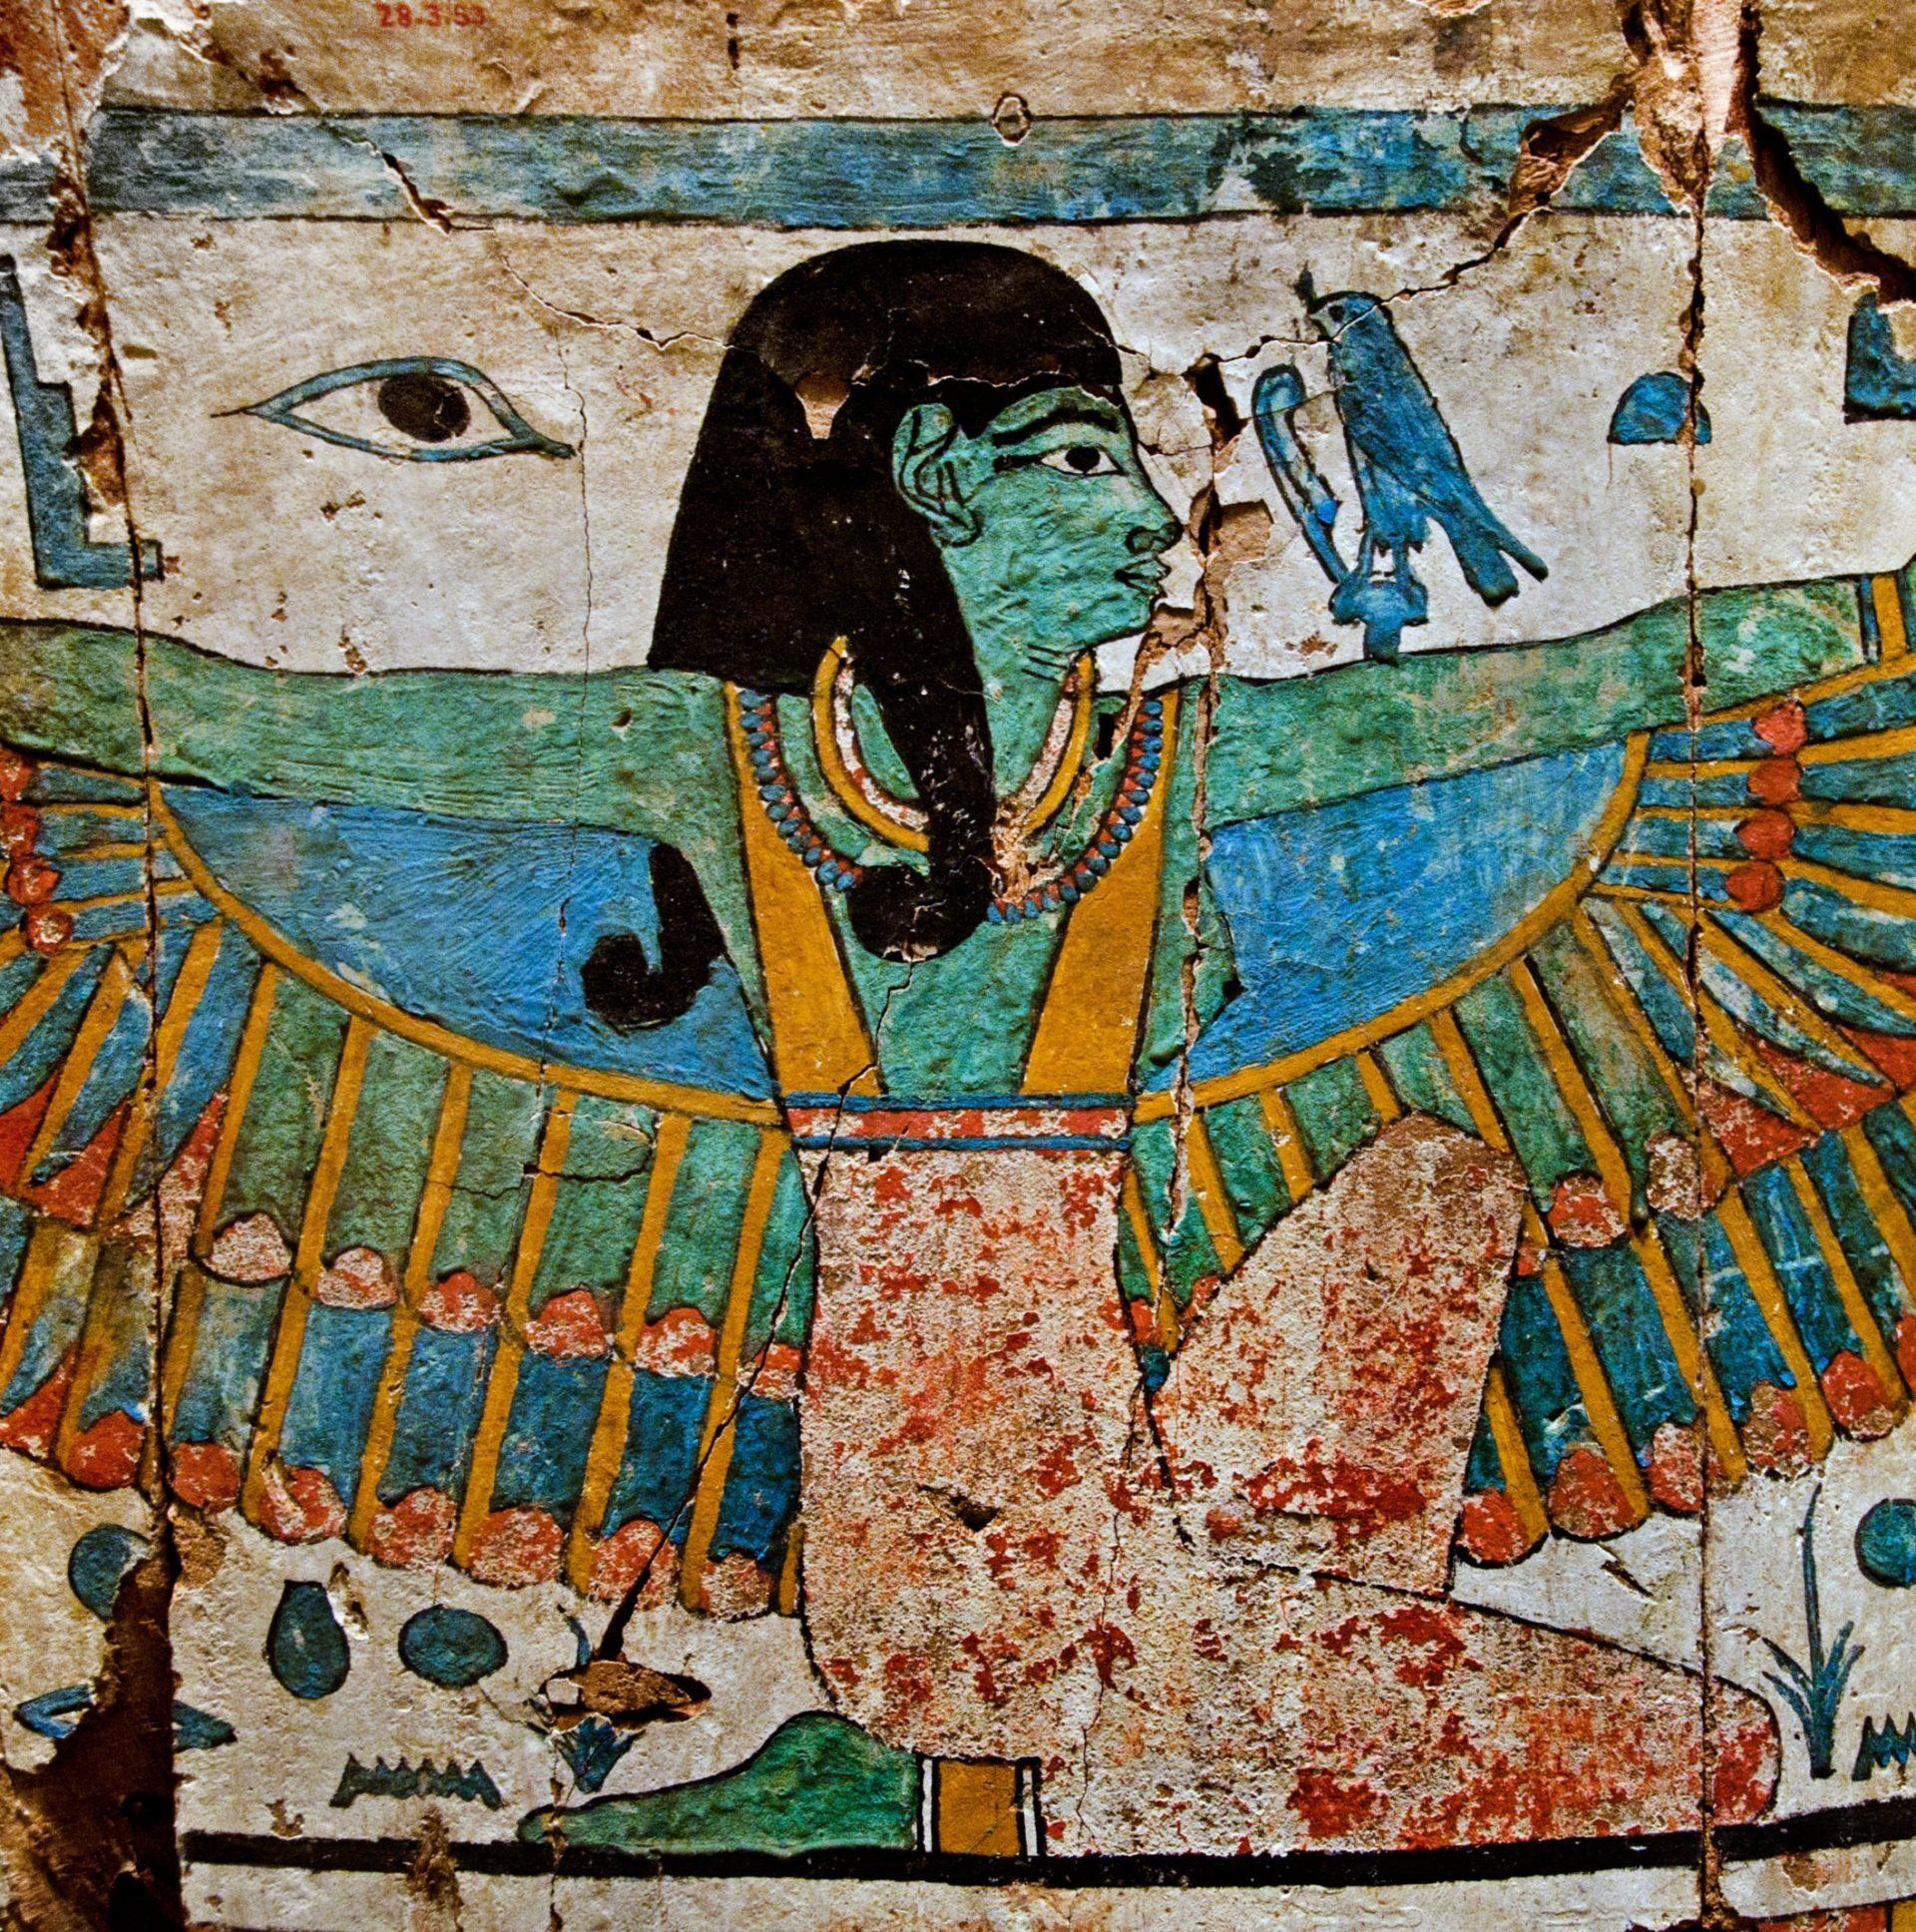 CY2FJ0 Coffin end Kushite Dynasty 712?664 B.C. Upper Egypt Thebes el-Khokha Tomb of Aafenmut gesso paint 56 cm